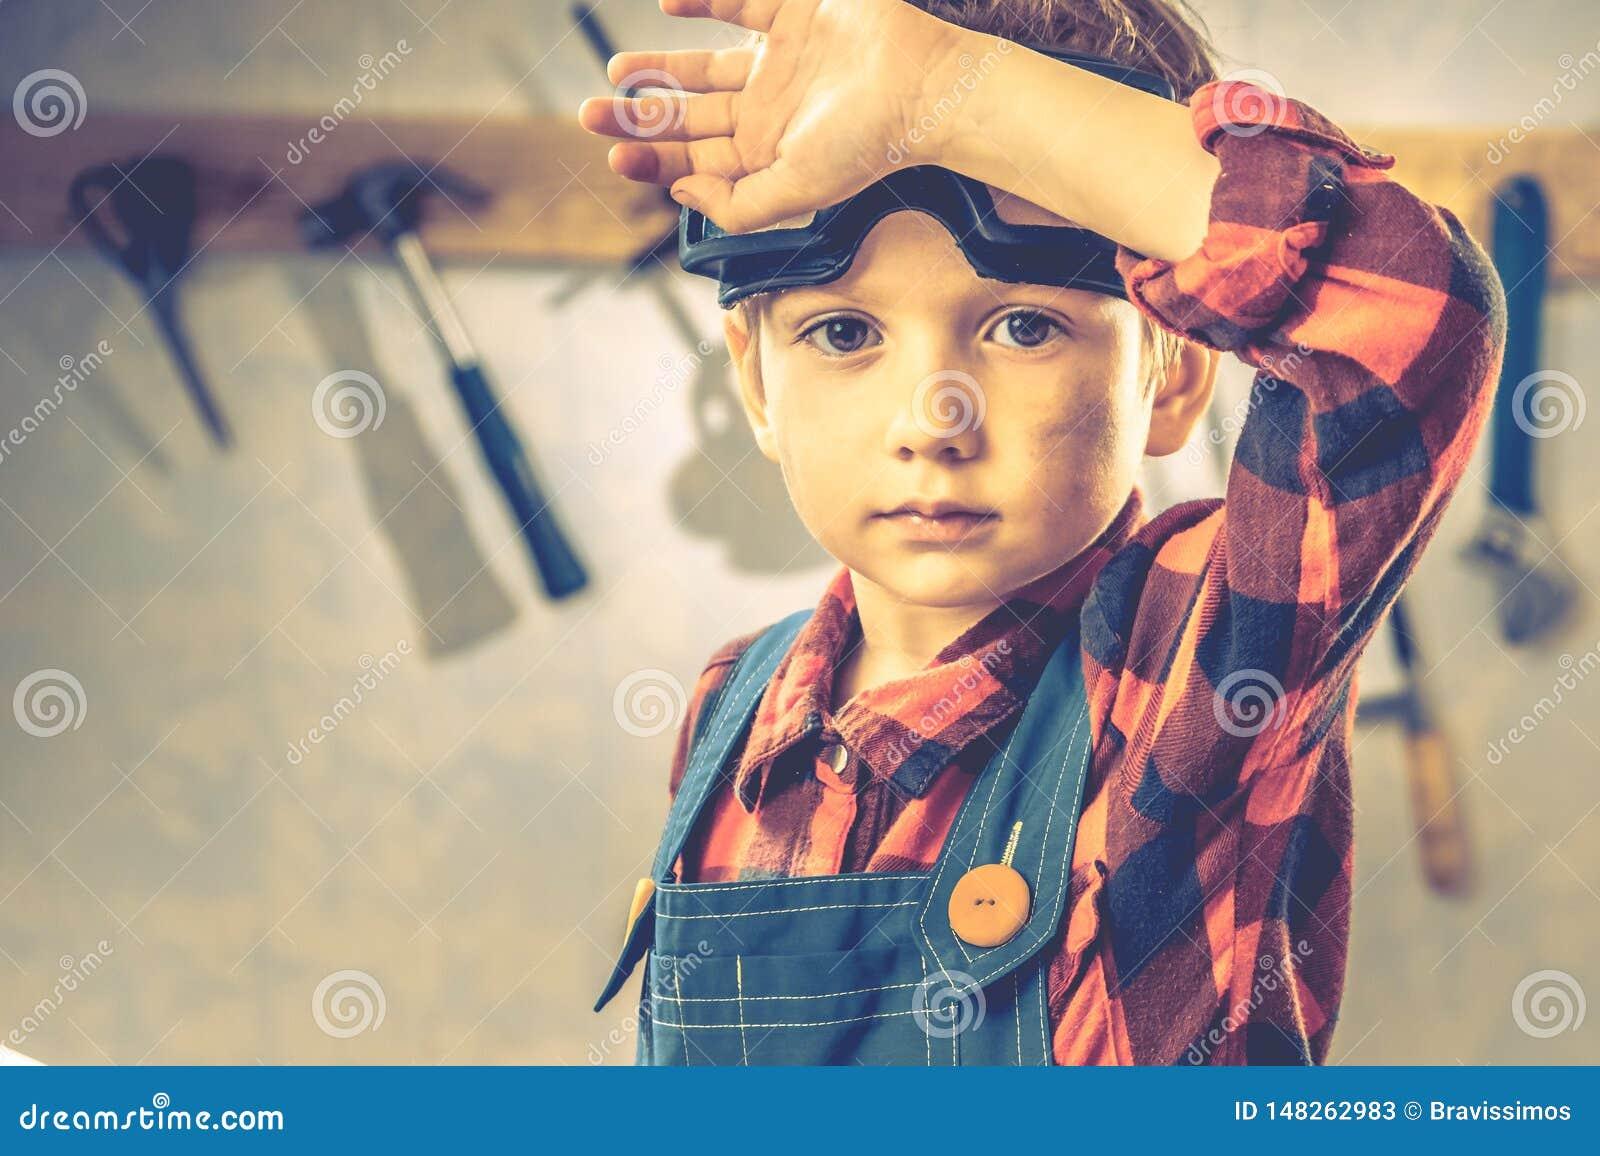 Концепция дня отцов ребенка, инструмент плотника, человек немного